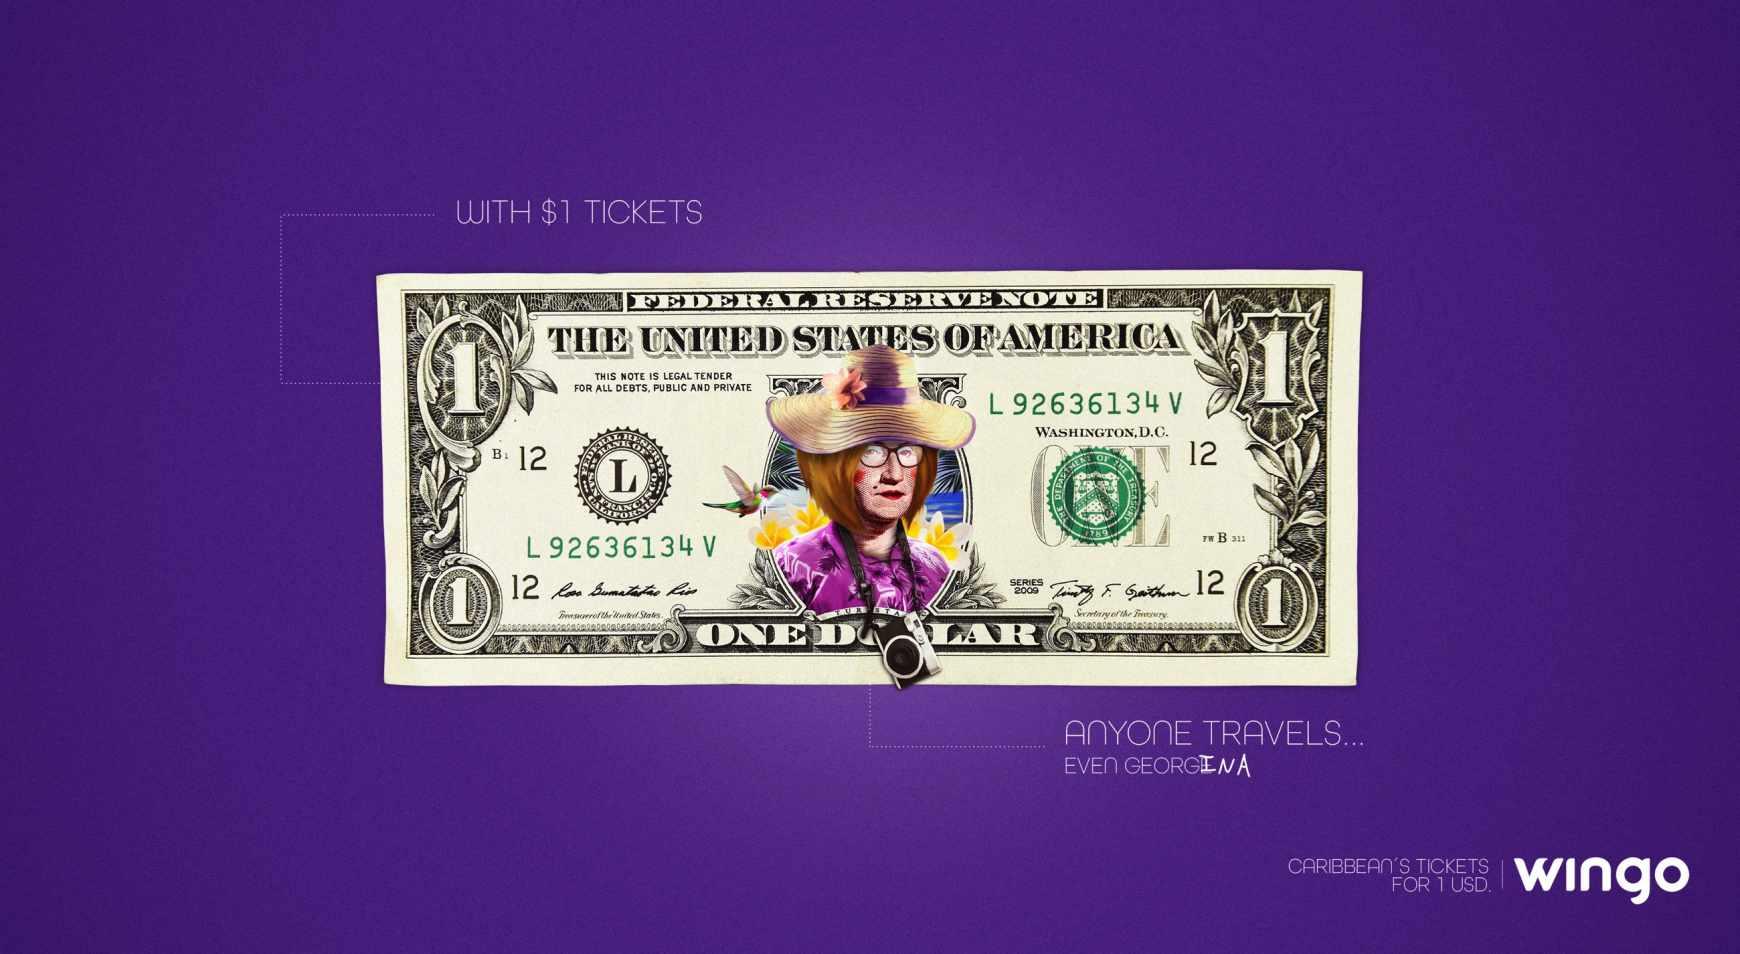 Wingo Print Ad - 1 Dollar Tickets, Georgina